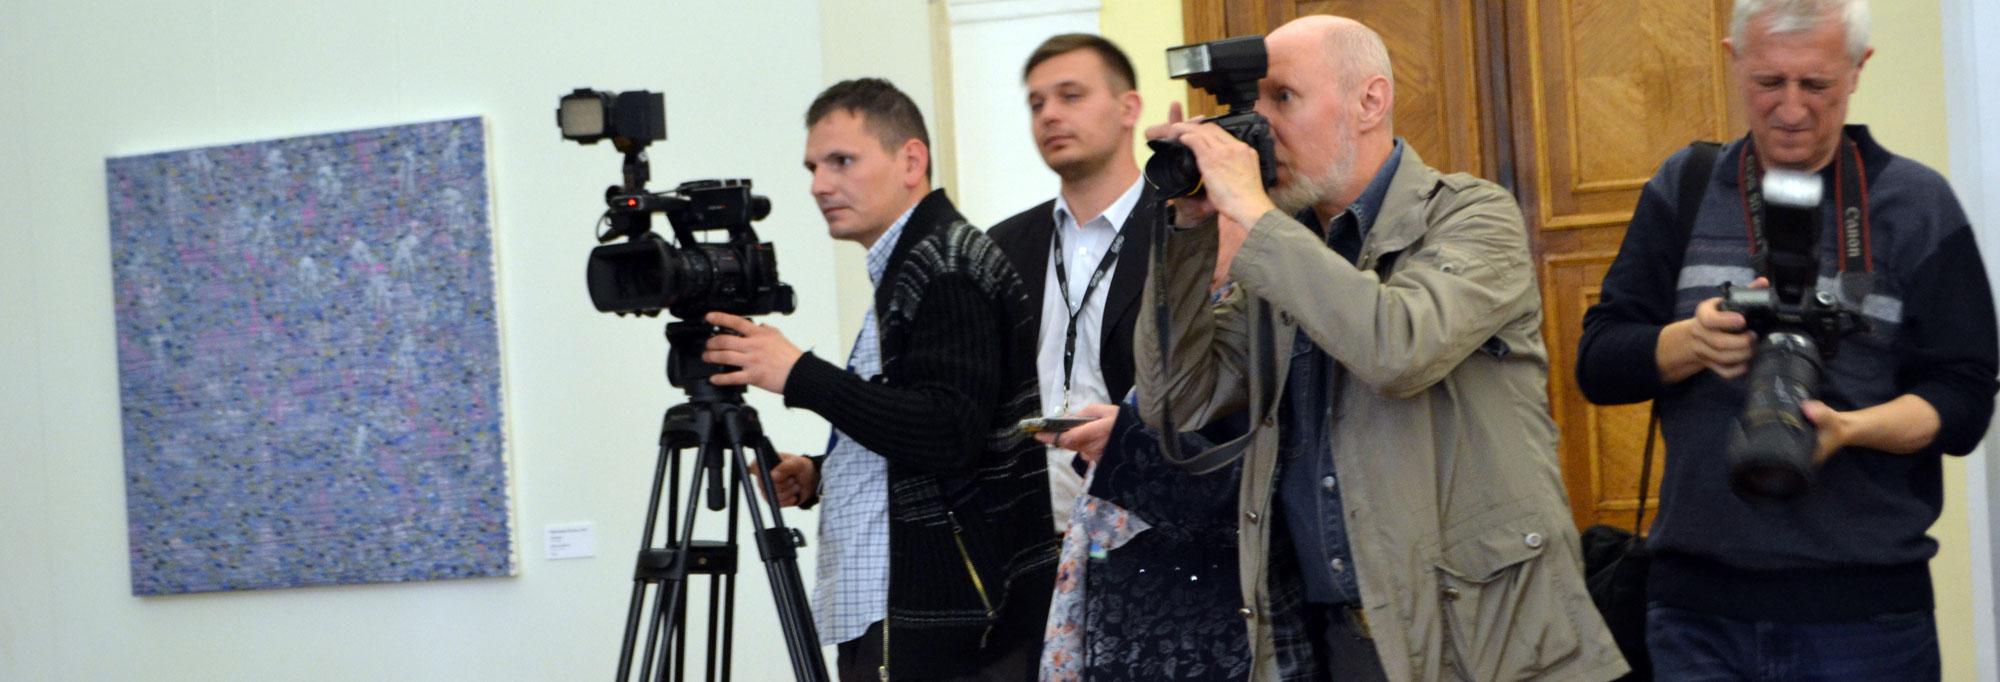 republik moldau news